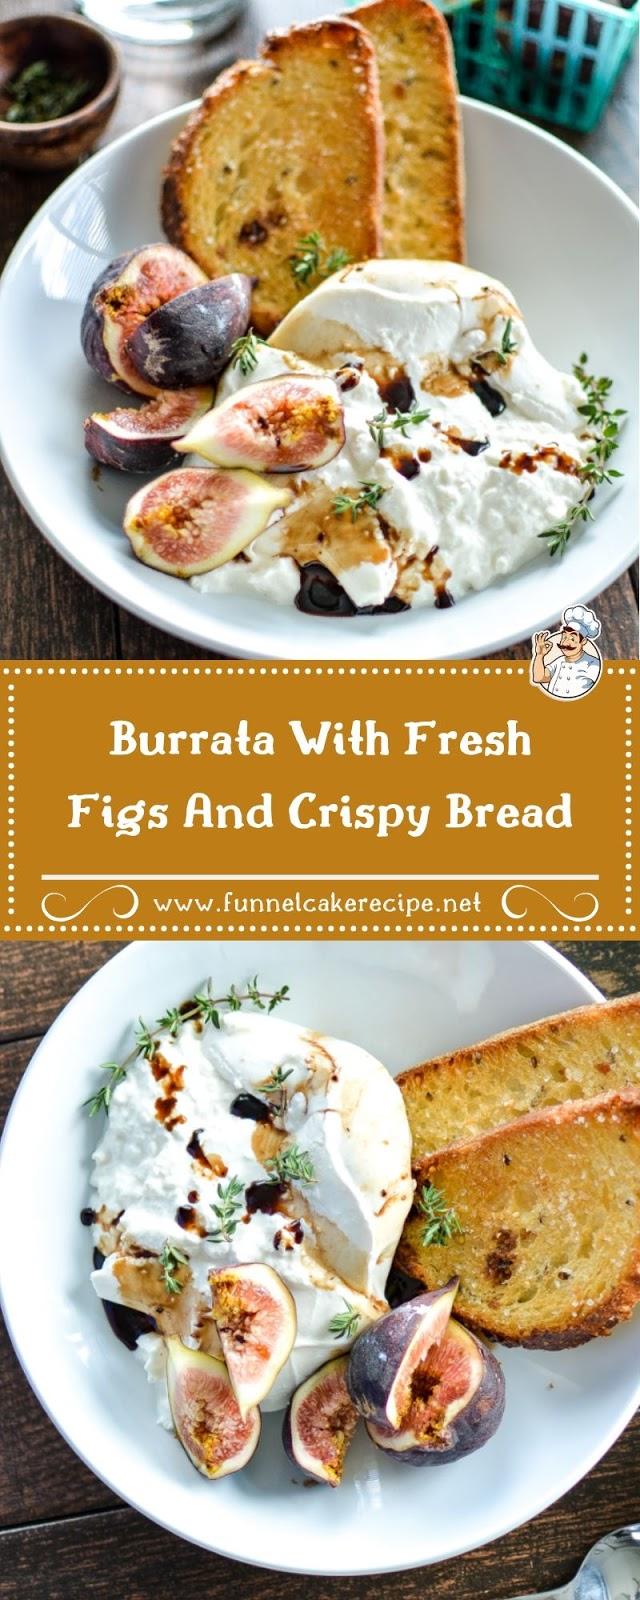 Burrata With Fresh Figs And Crispy Bread